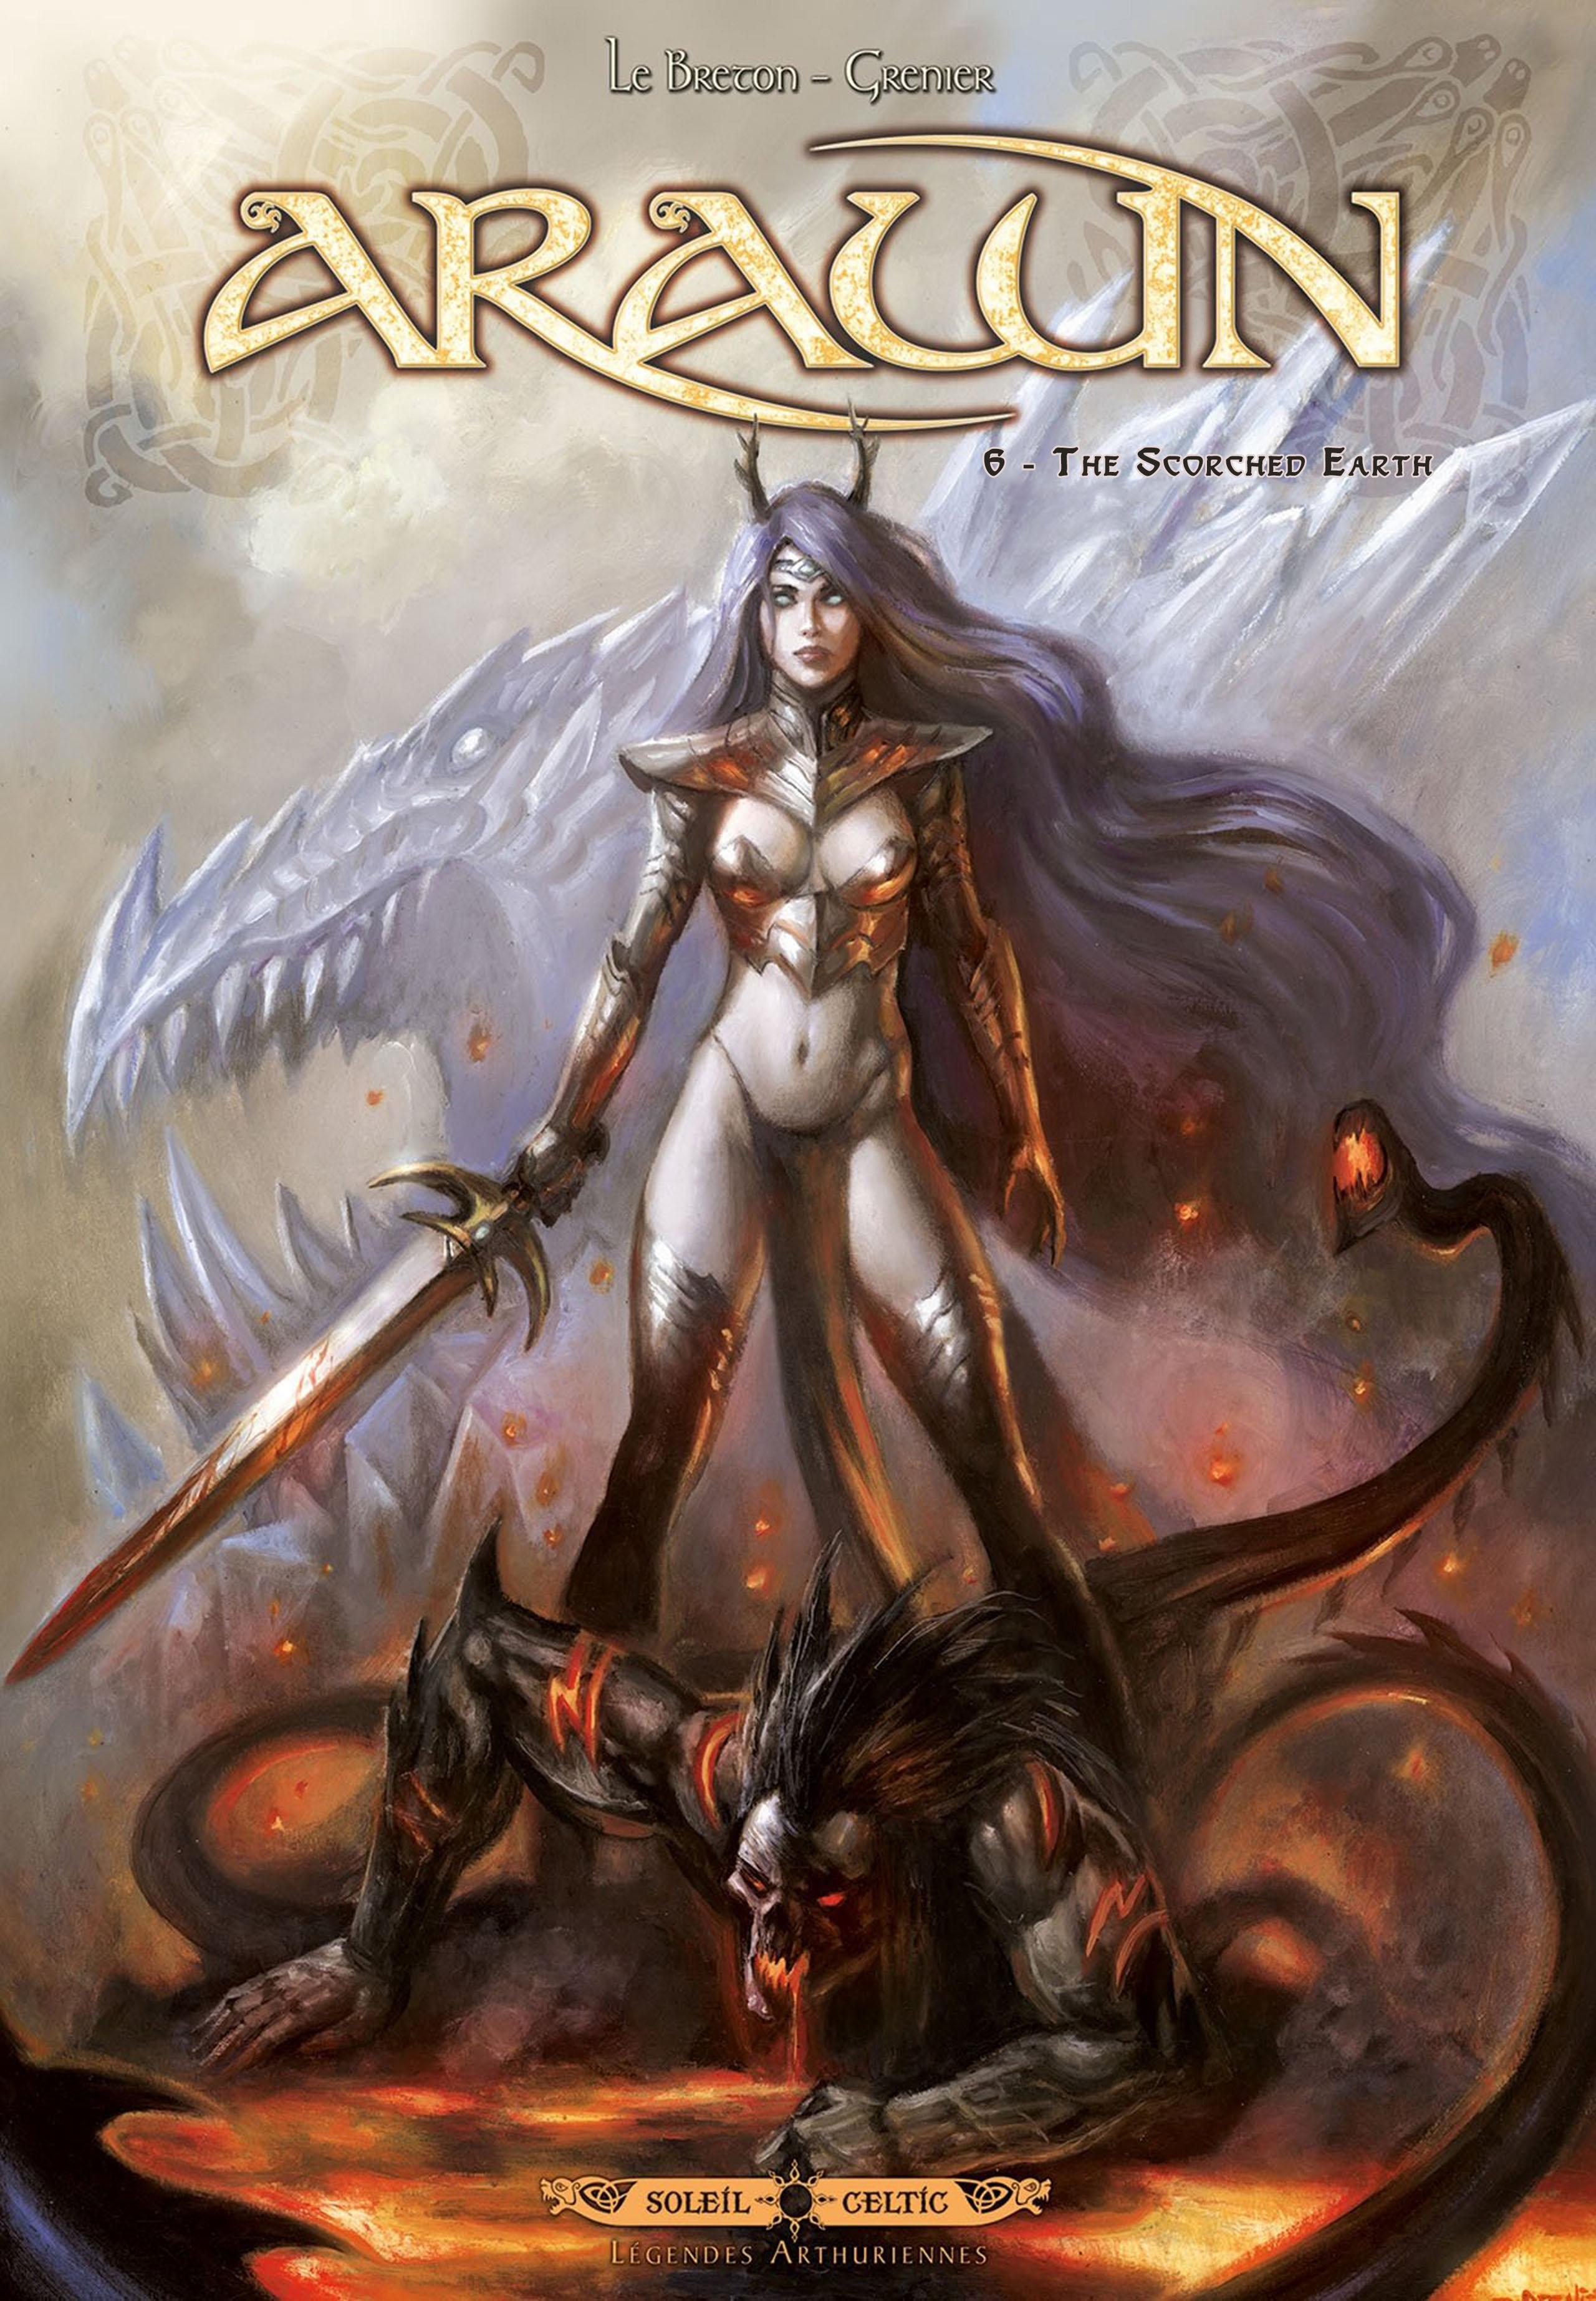 Read online Arawn comic -  Issue #6 - 1